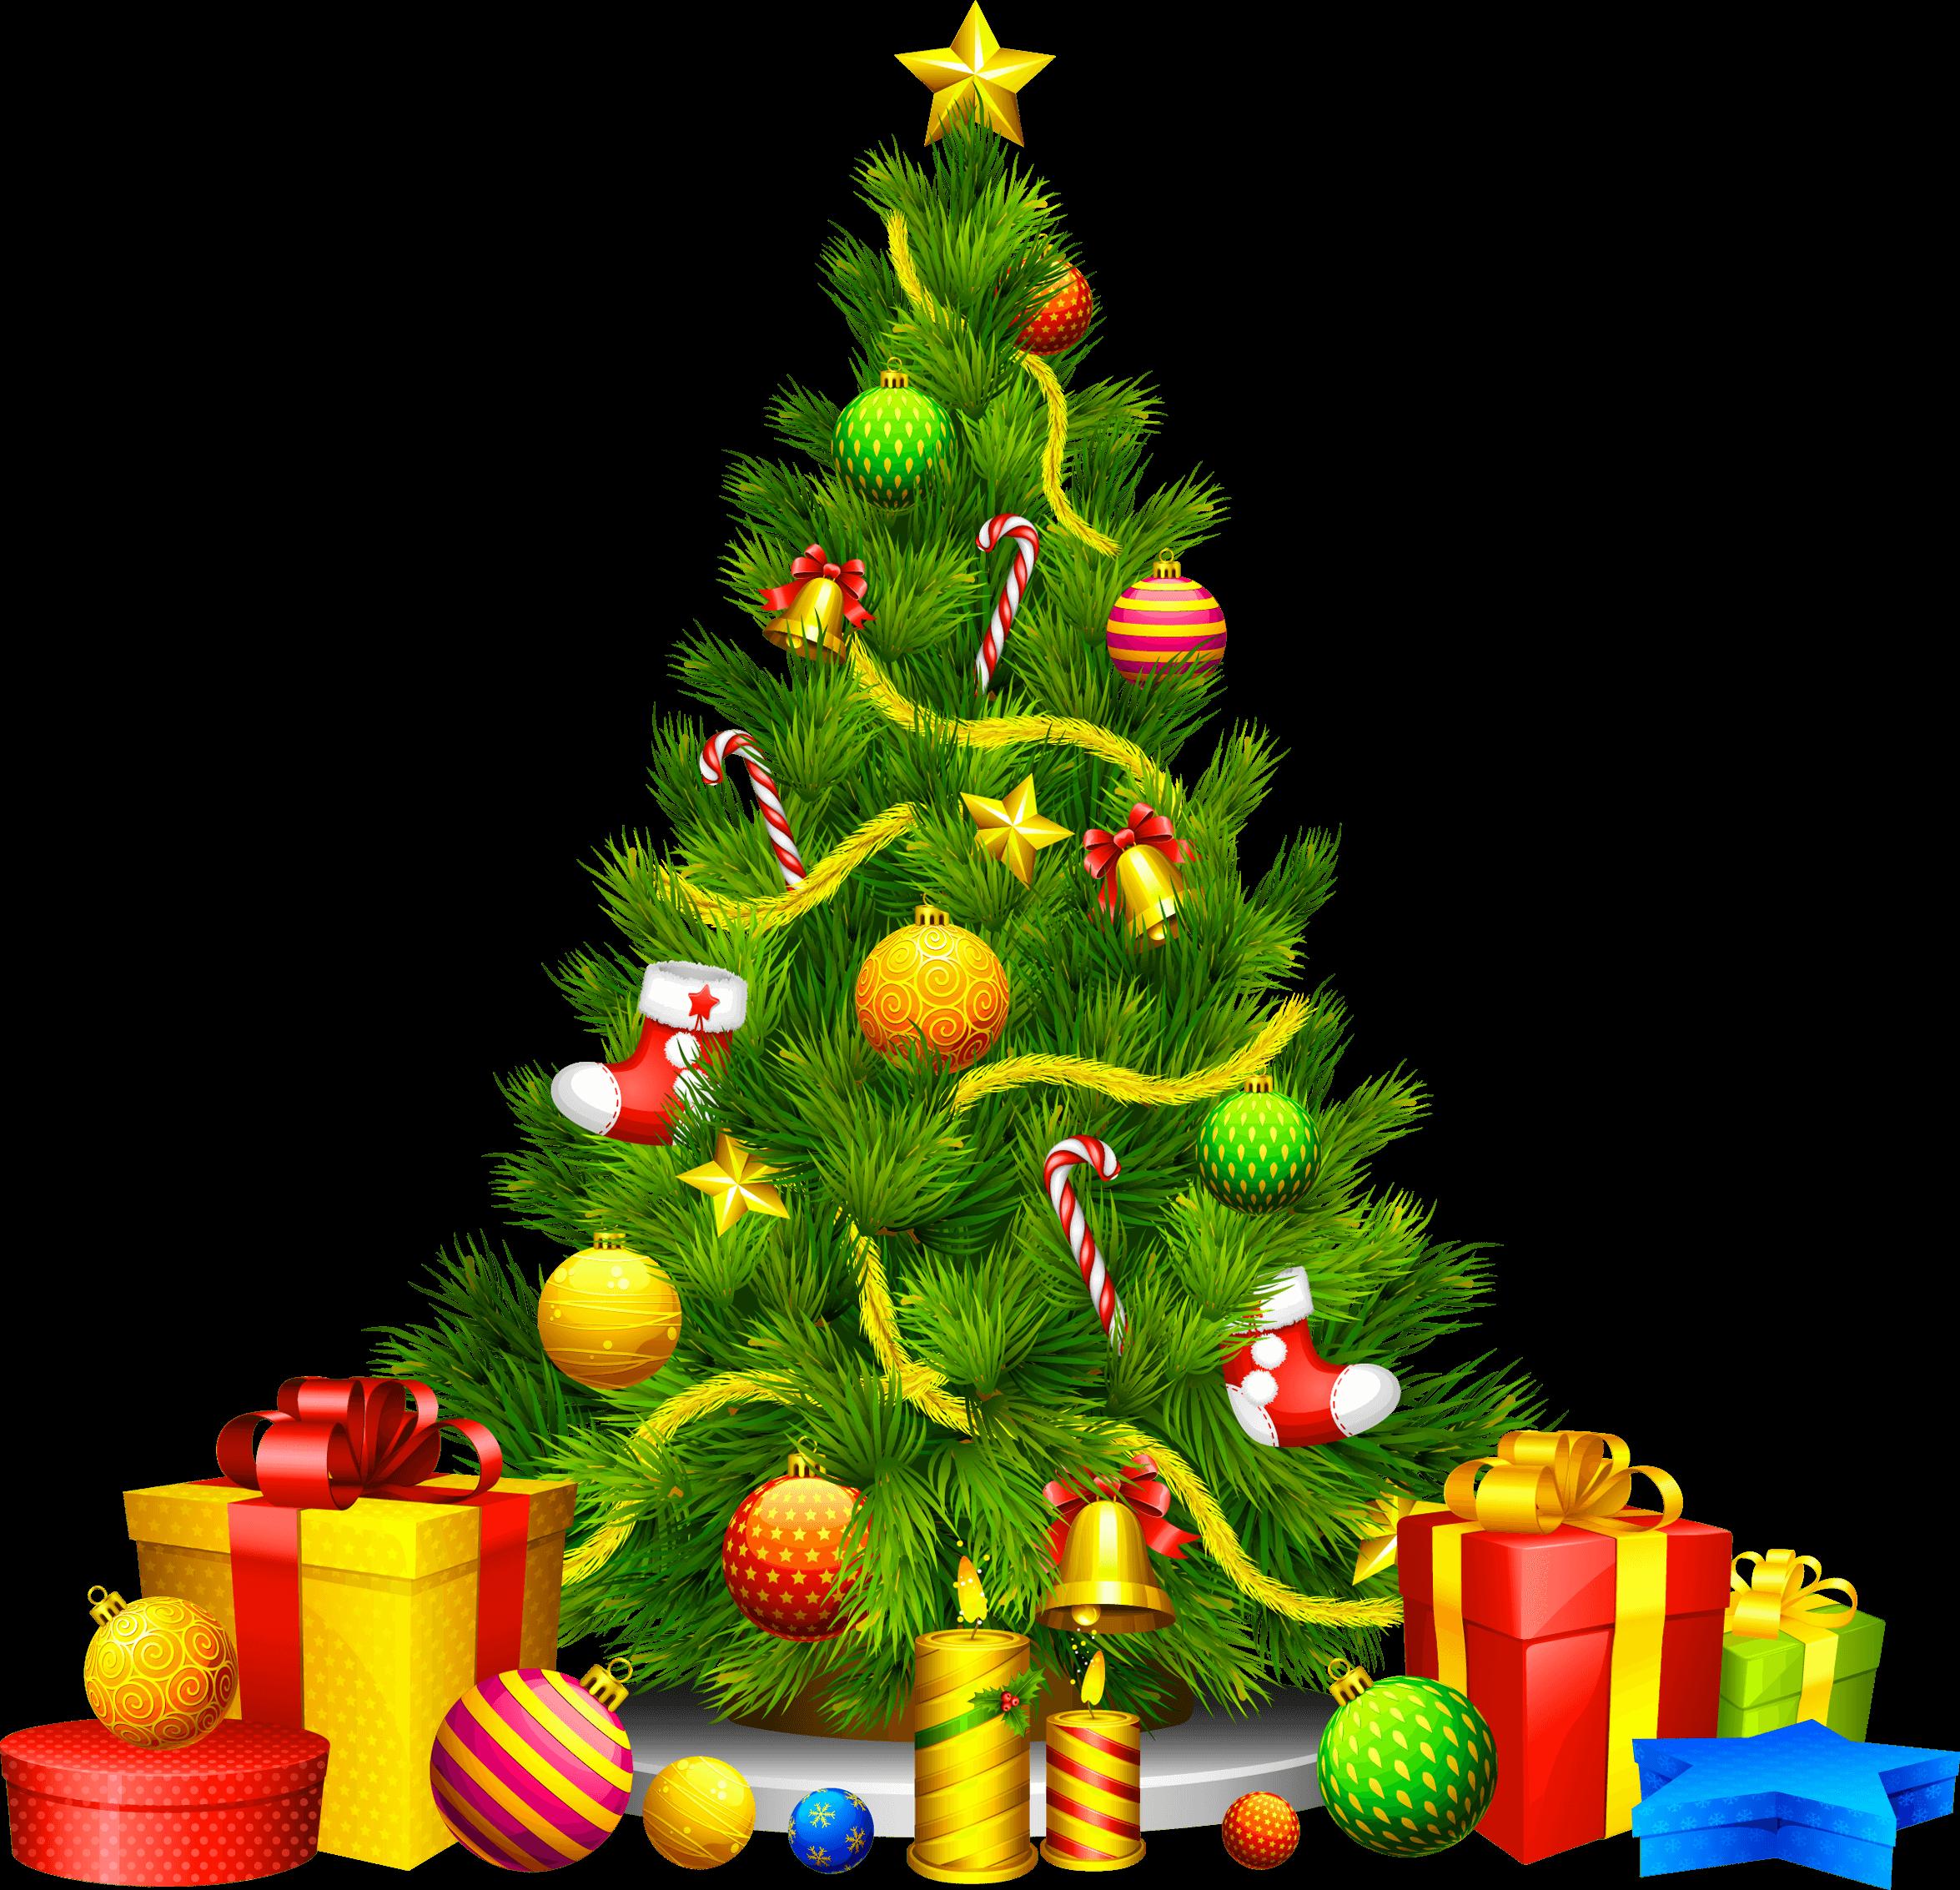 Gifts Cartoon Christmas Fir Tree Png Image Christmas Tree Images Christmas Tree With Presents Christmas Tree Sale